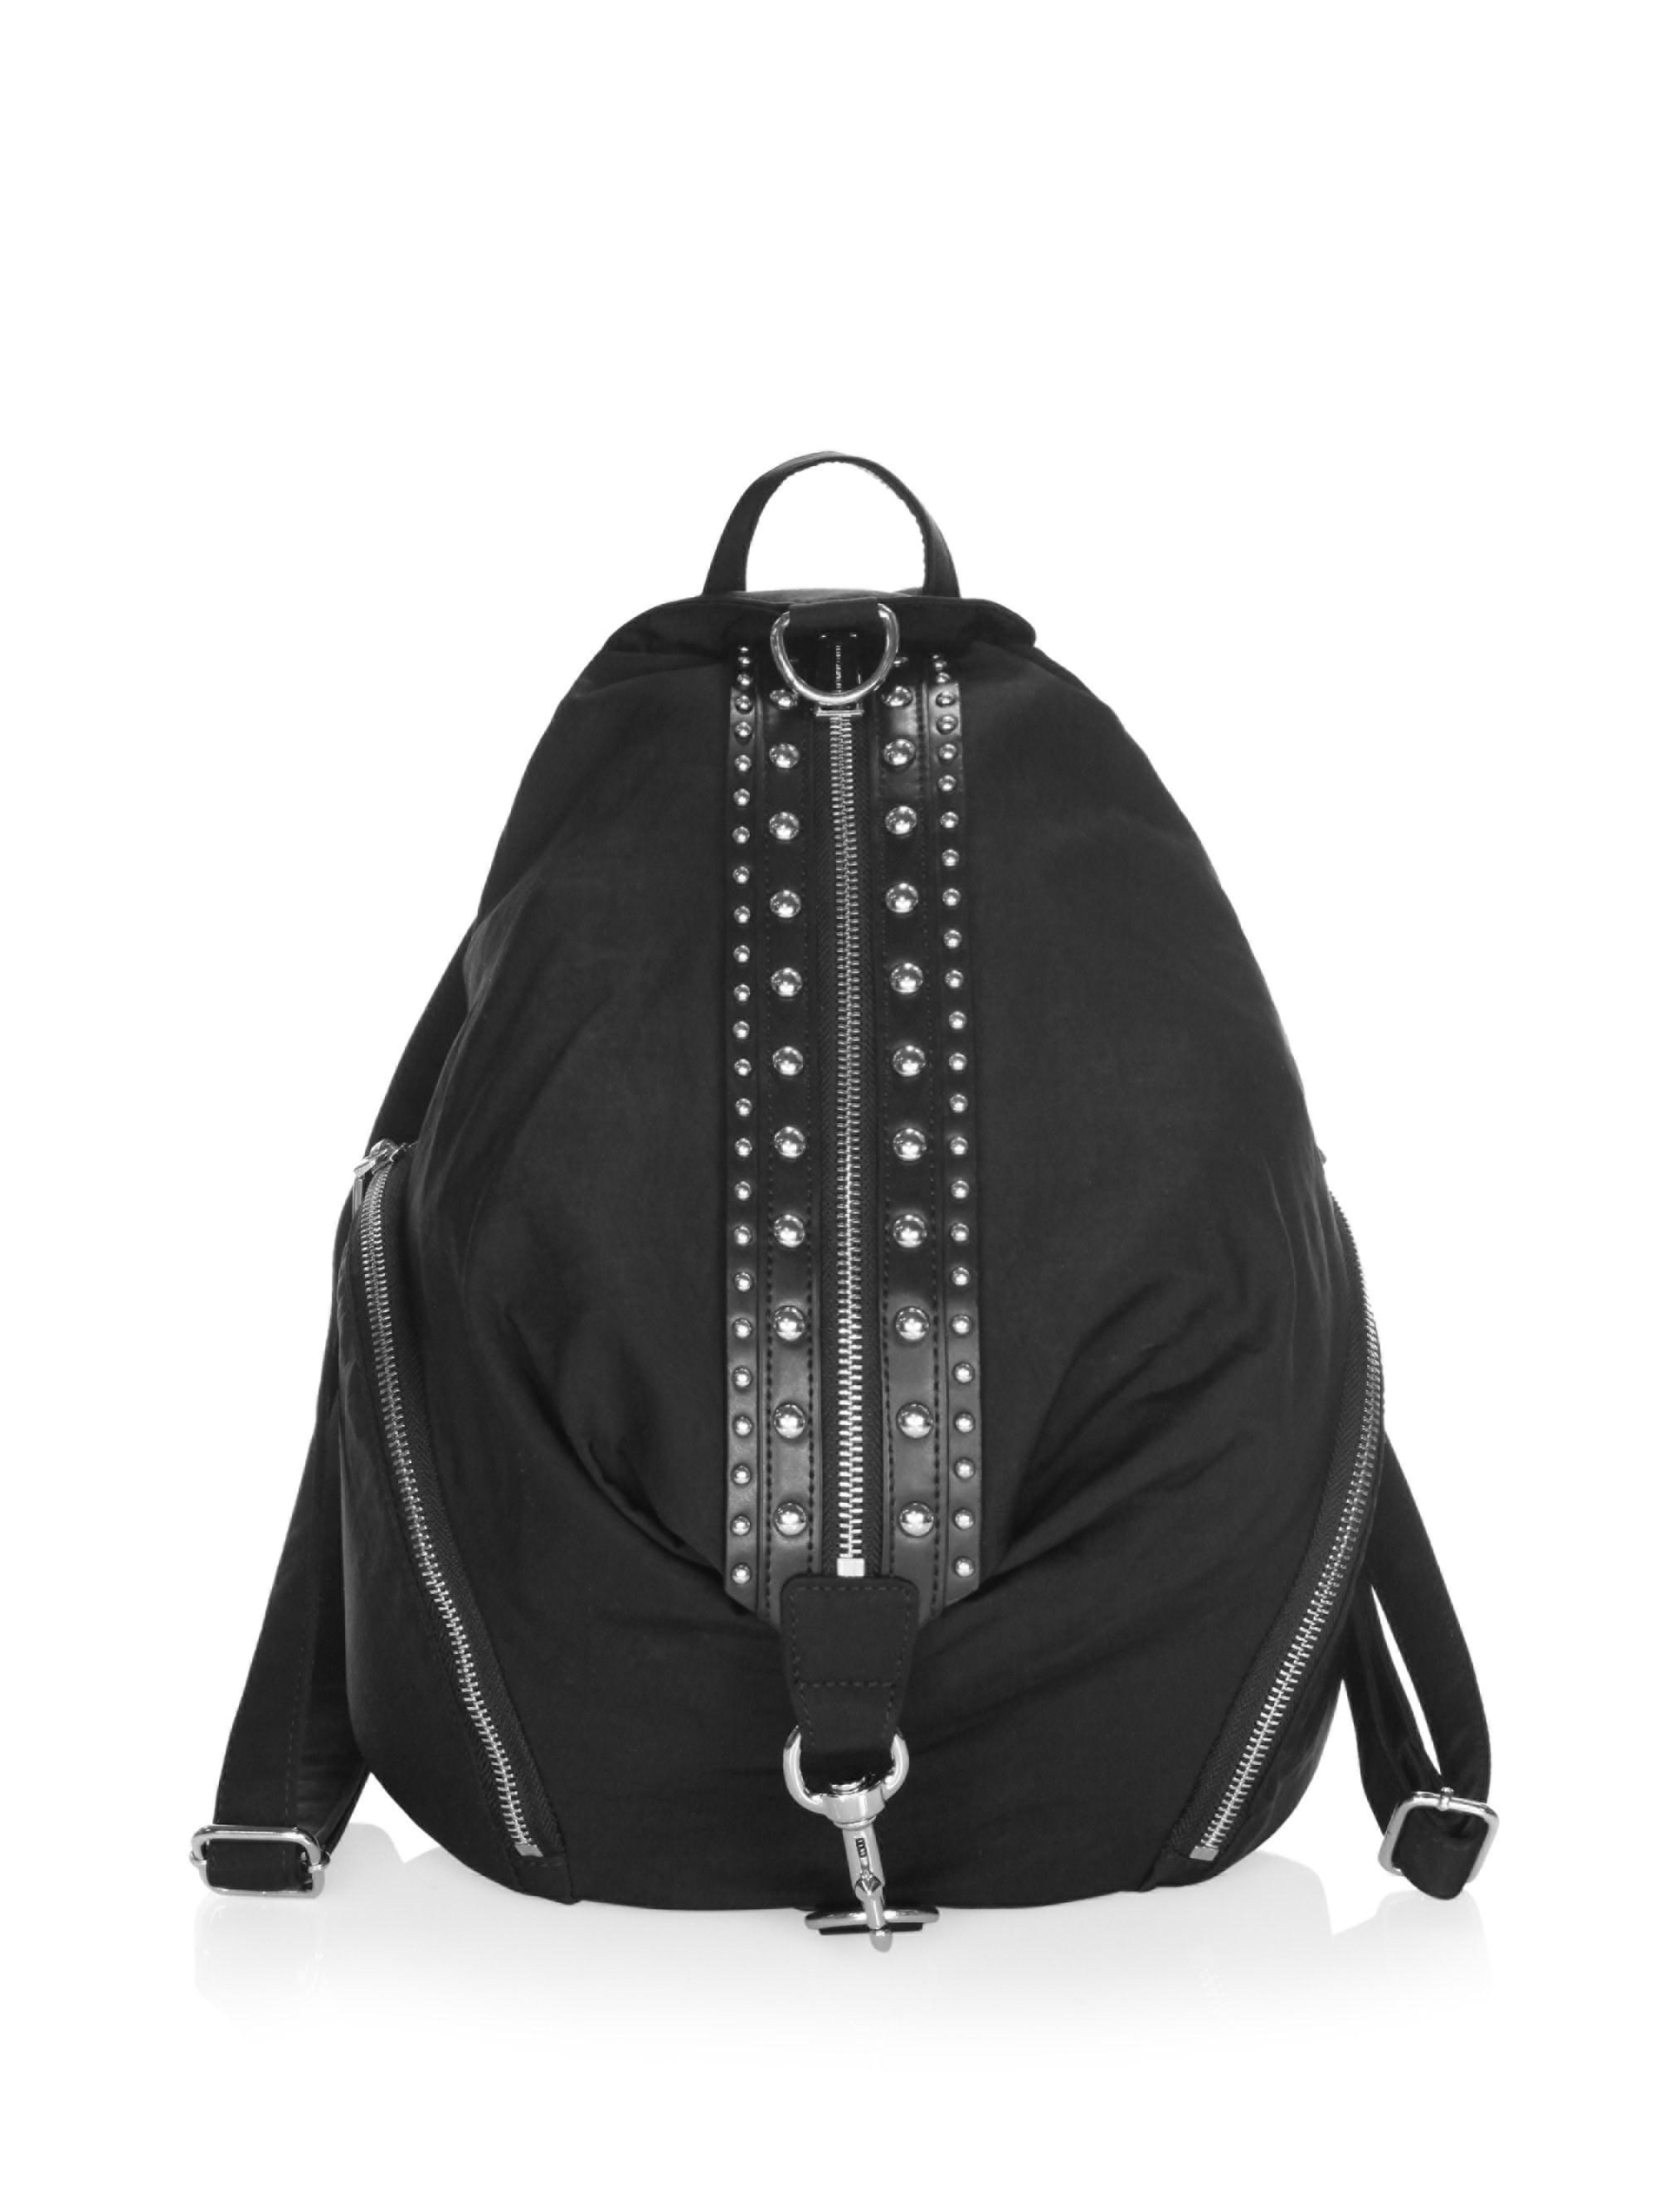 56b14723545 Womens Black Military Nylon Dome Backpack- Fenix Toulouse Handball